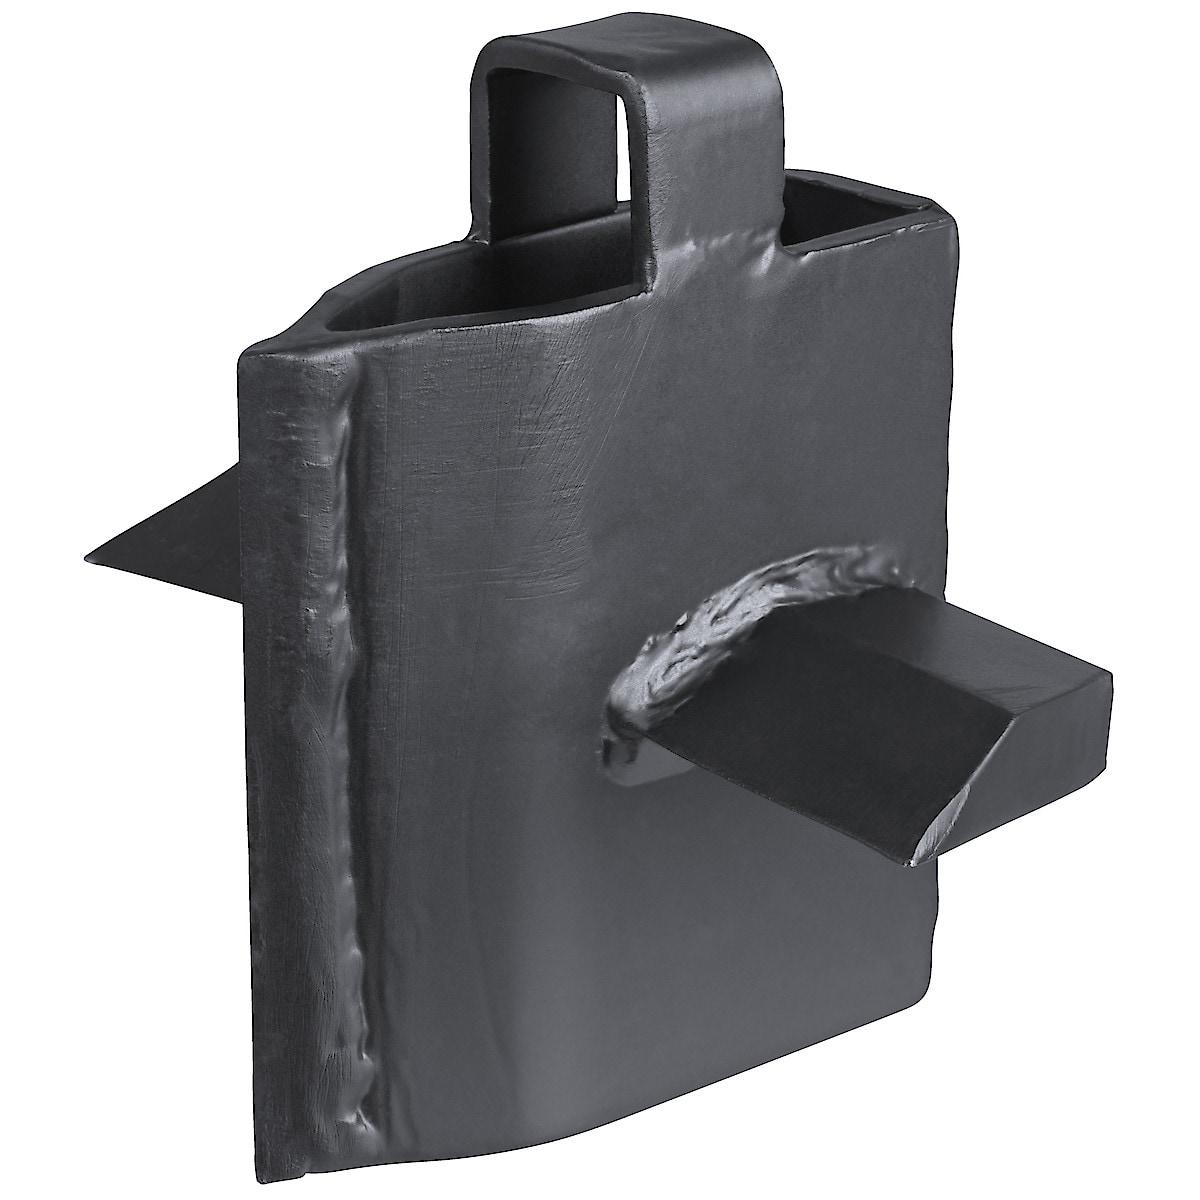 Cocraft 4-veiskniv